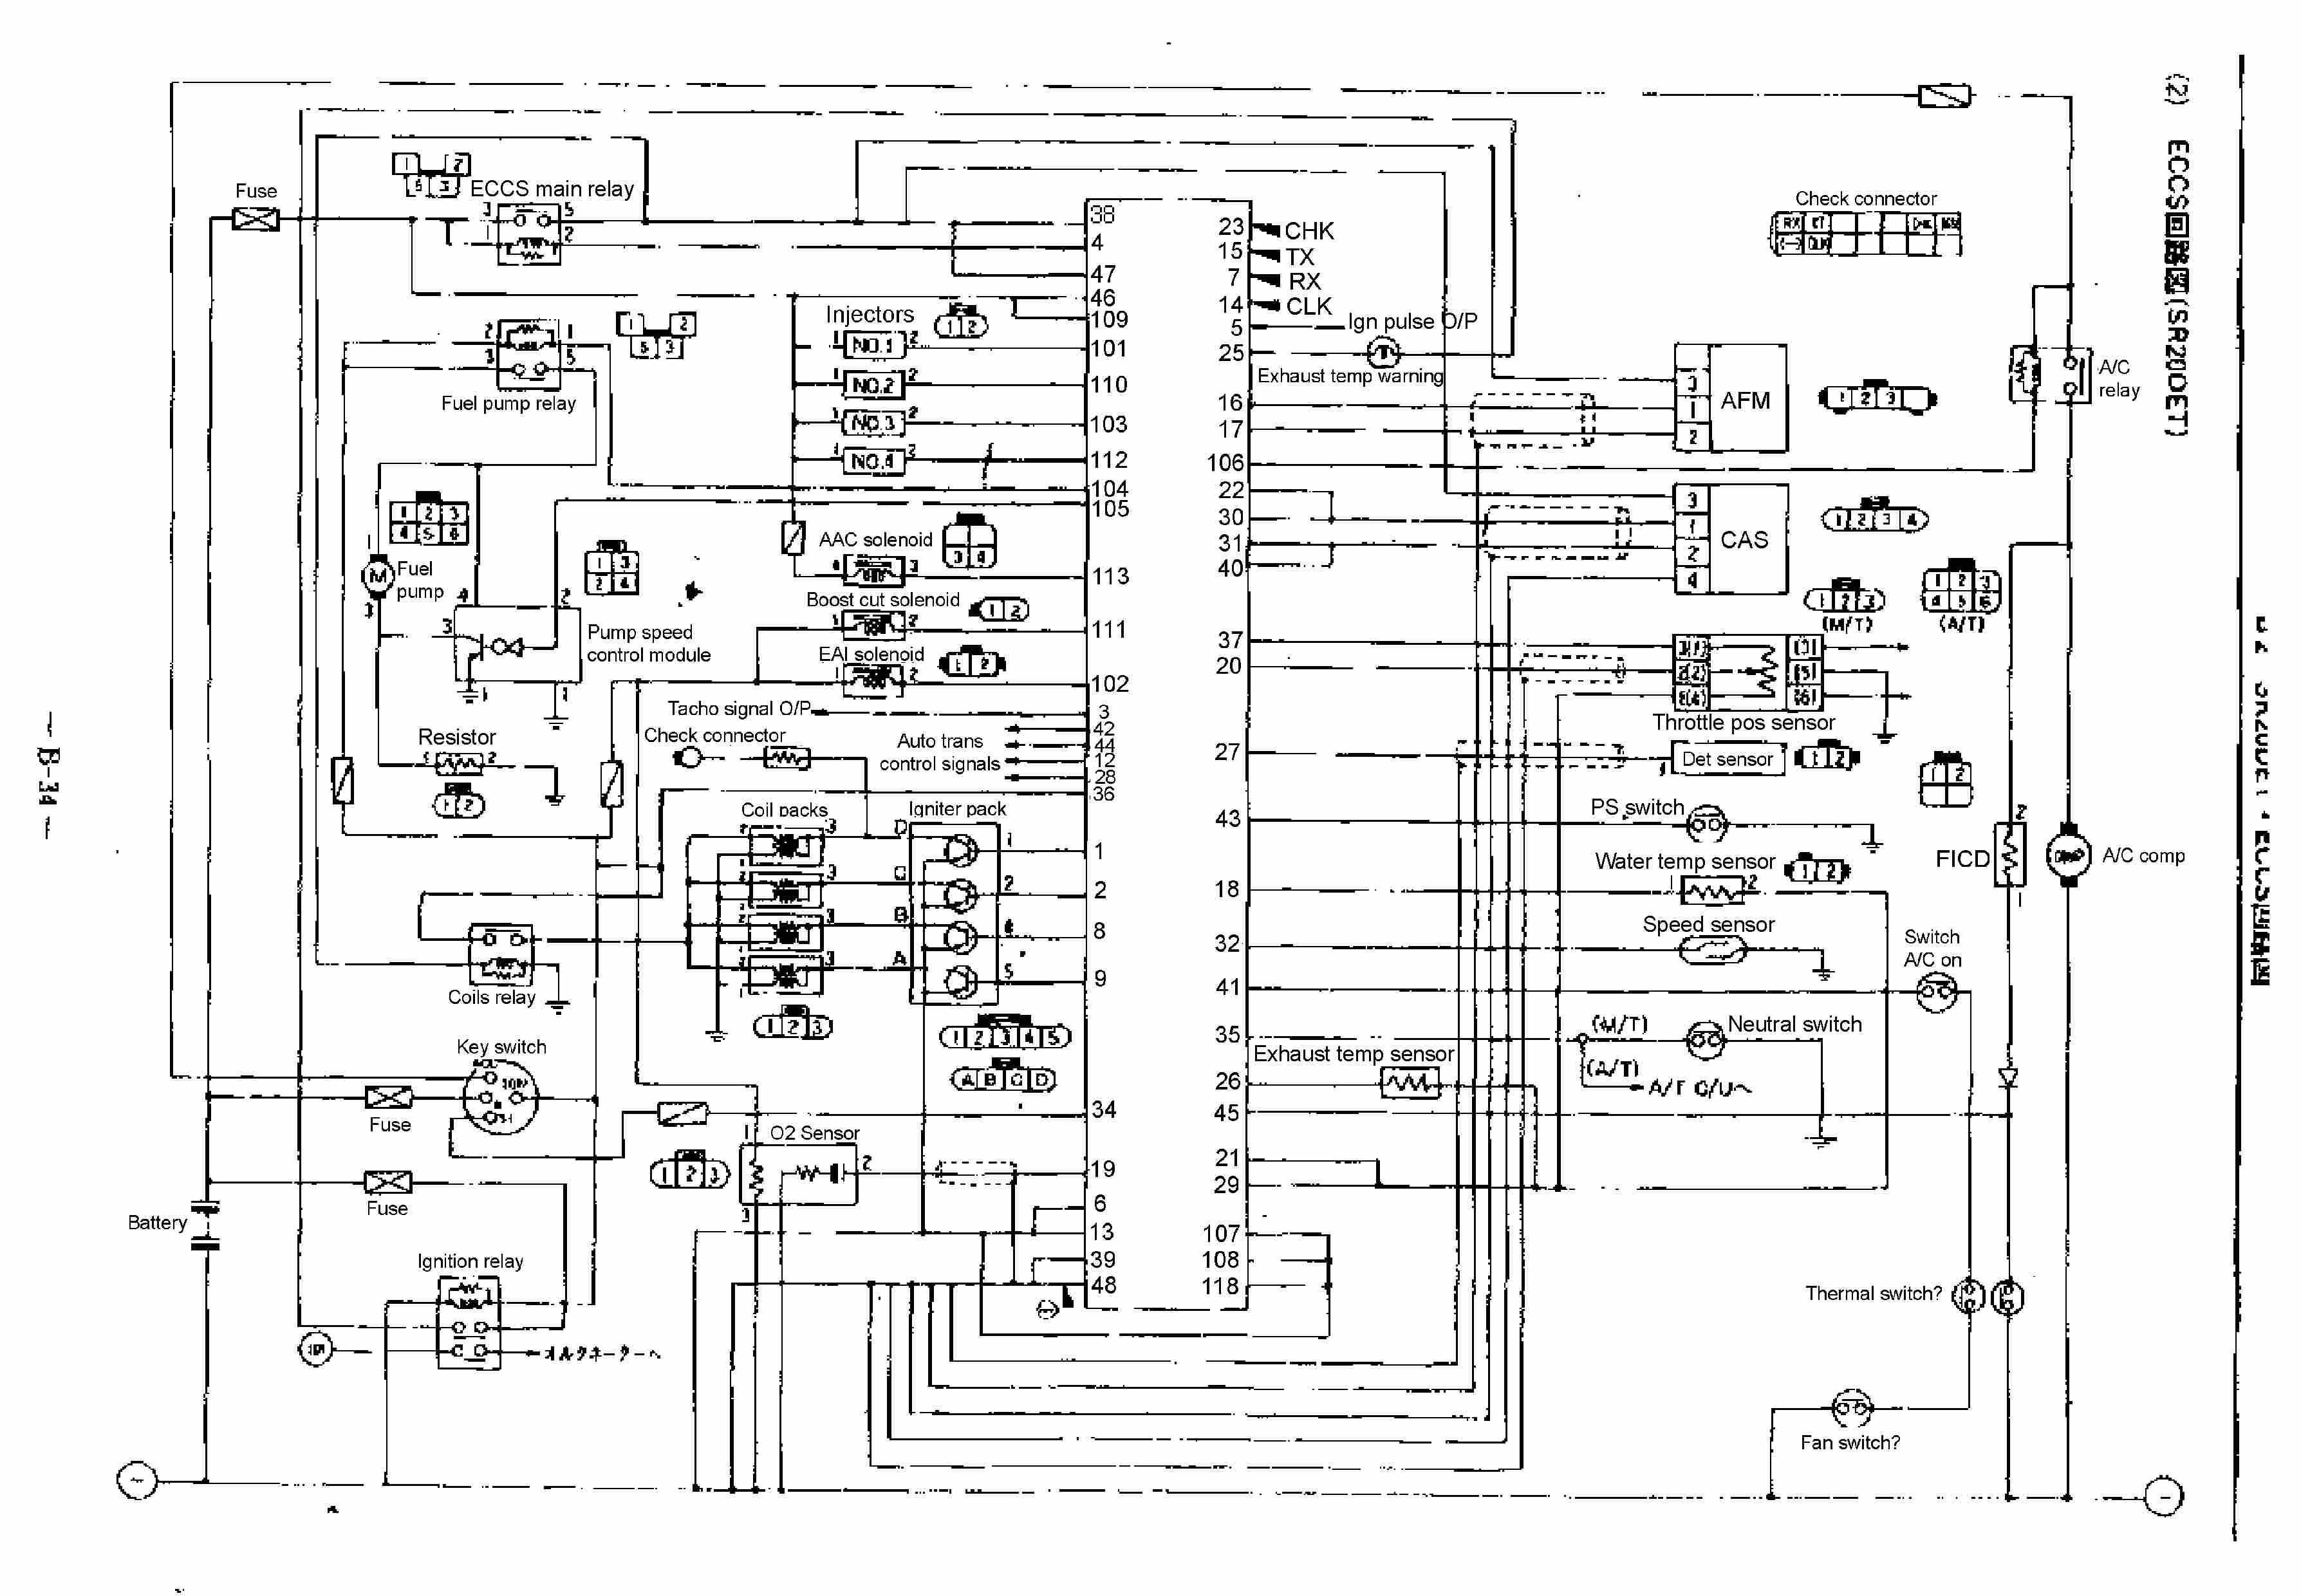 Jaguar S Type Engine Diagram Wiring Diagram Jaguar S Type Valid Jaguar Body Diagram Enthusiast Of Jaguar S Type Engine Diagram